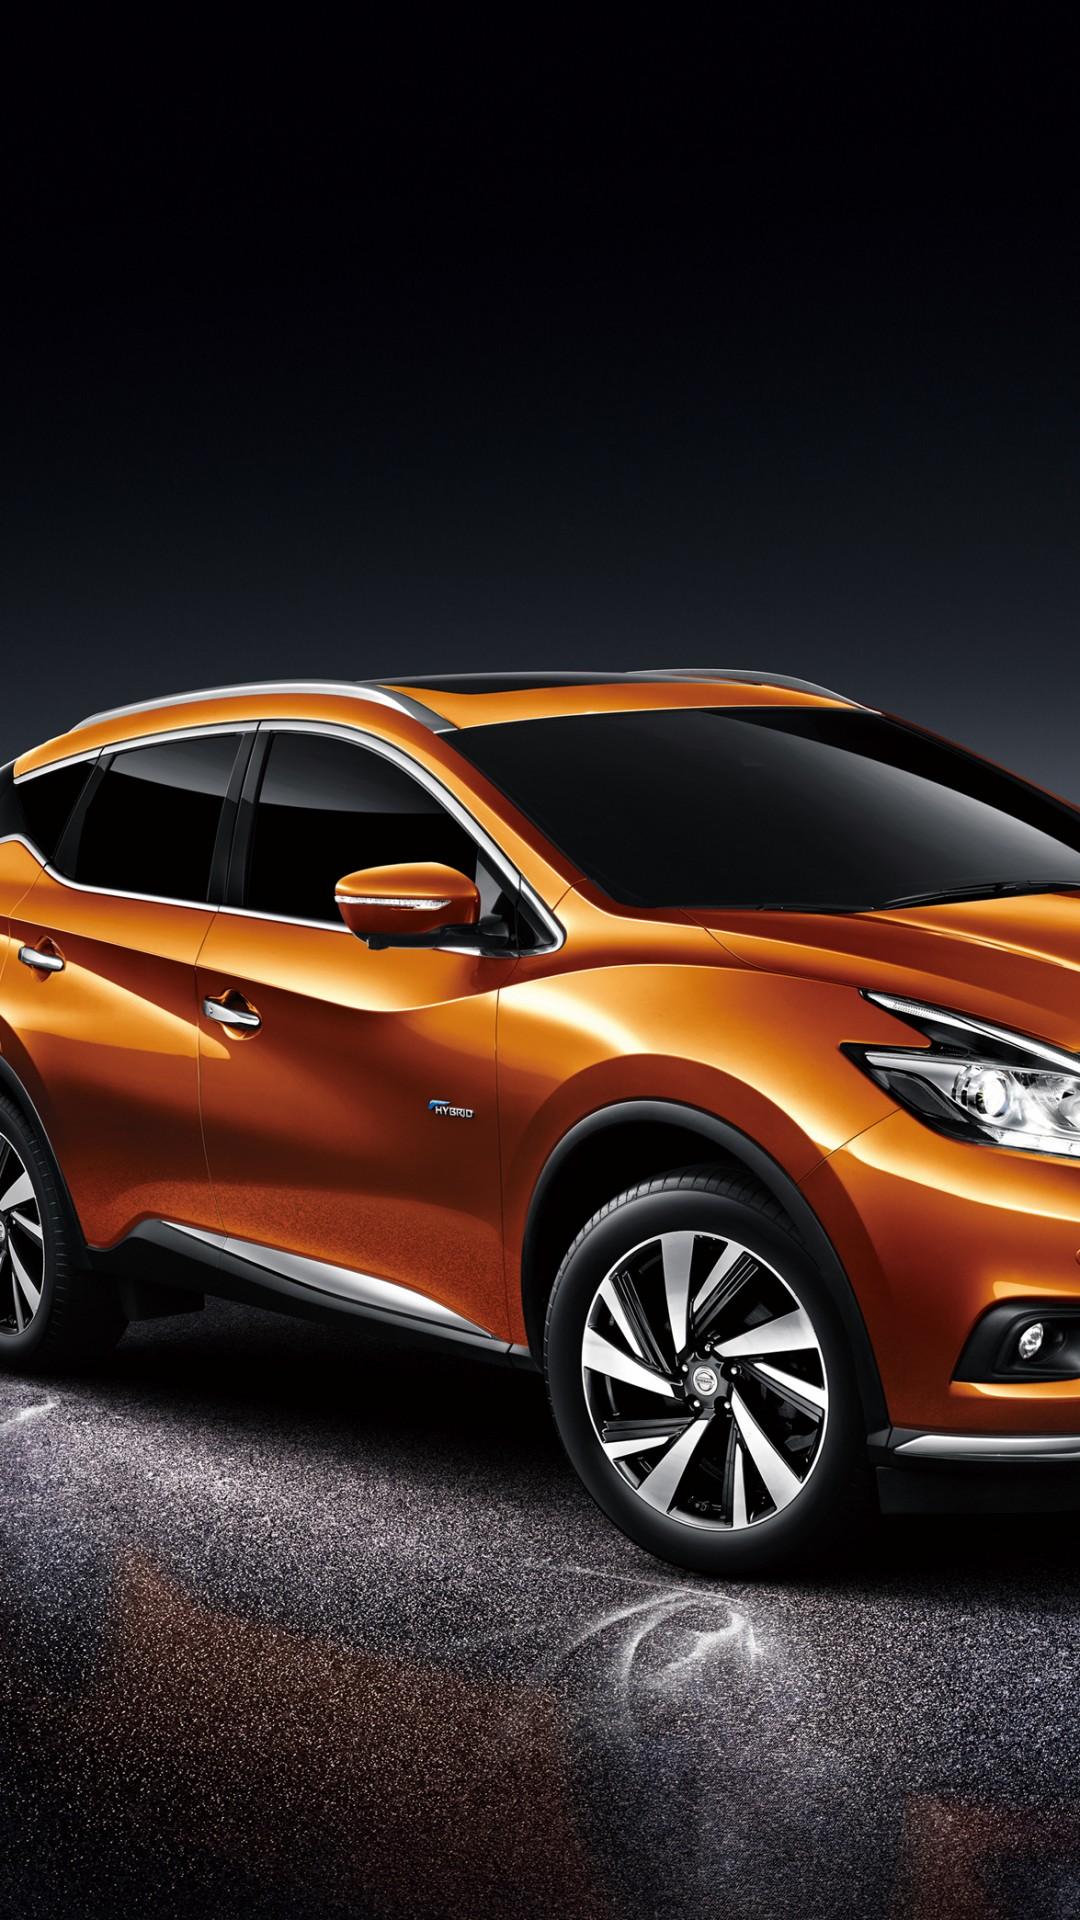 Rent A Suv >> Wallpaper Nissan Murano, Hybrid, crossover, orange, Cars & Bikes #10587